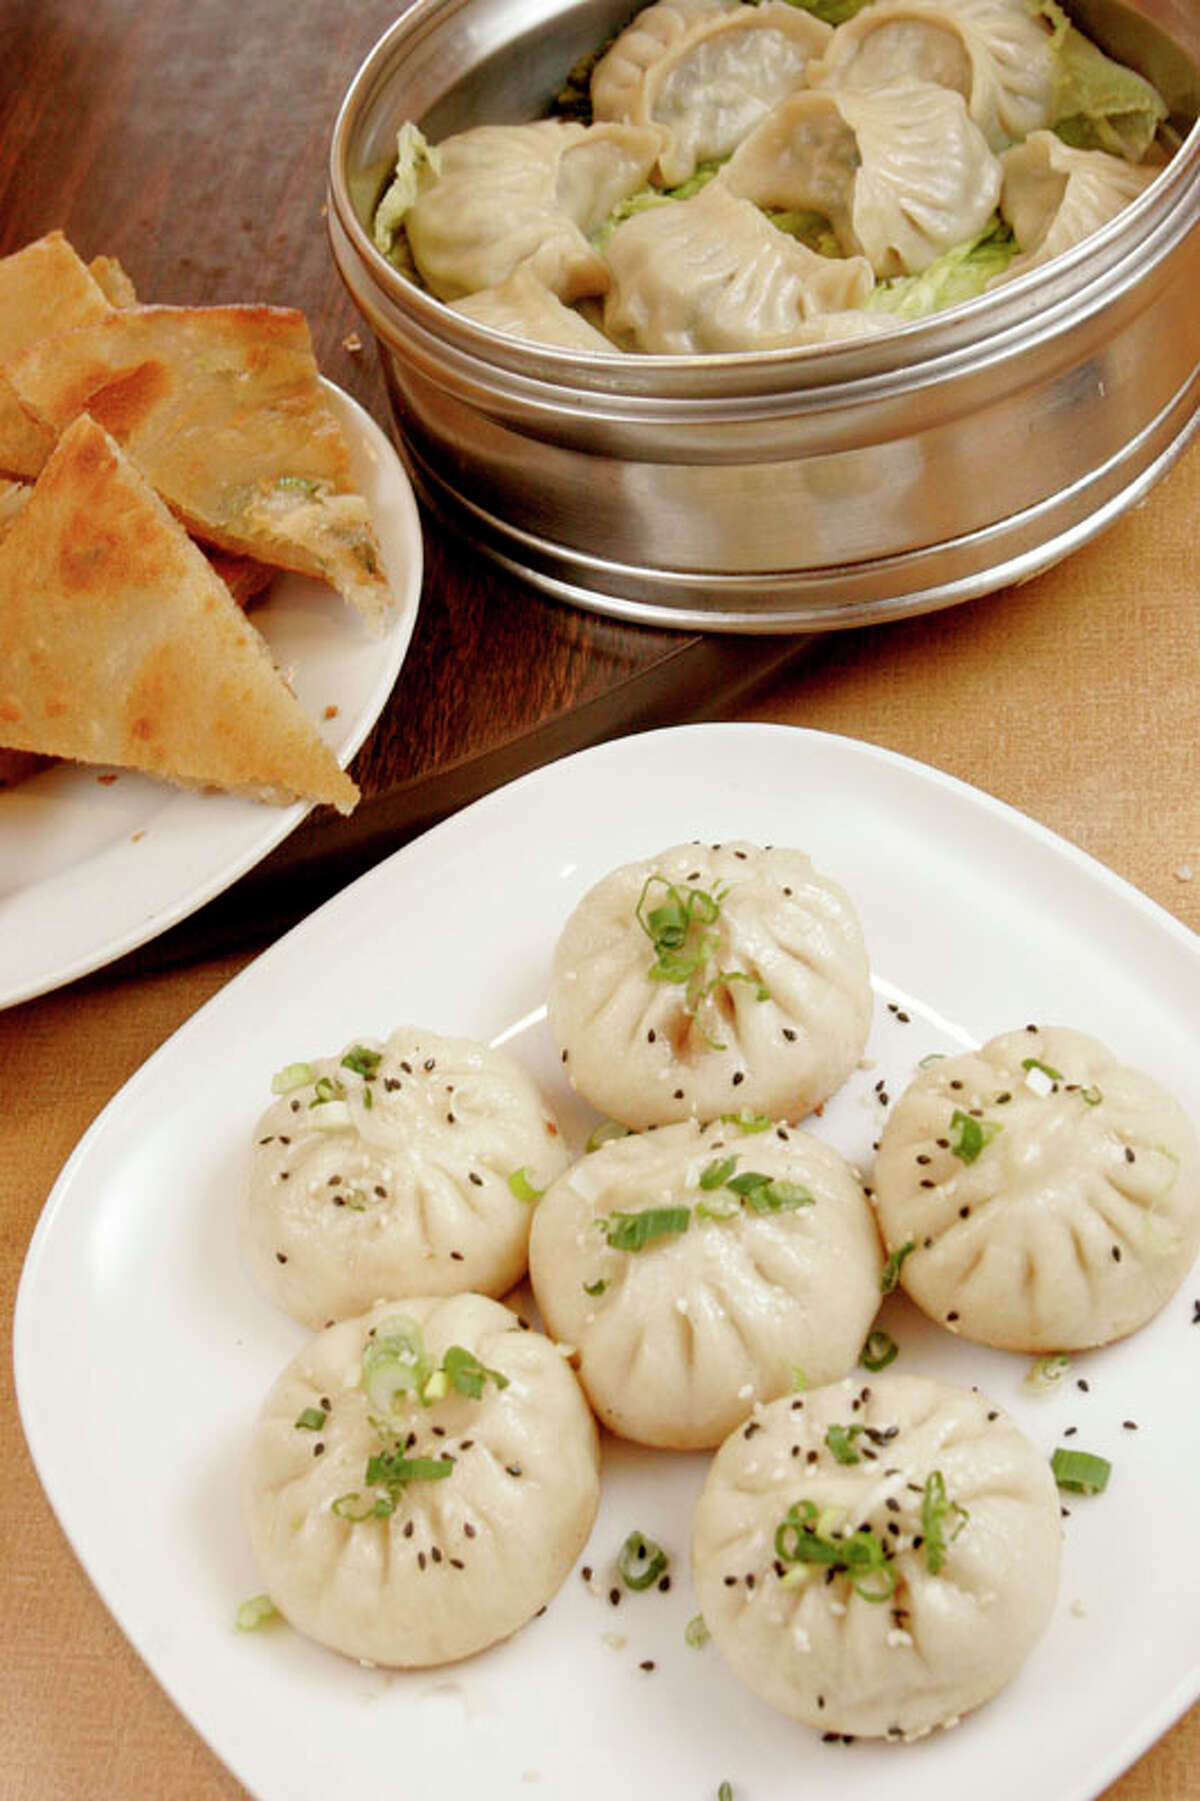 Fu Fu Cafe Cuisine: Chinese Dish: pan fried pork bun Entree price range: $ Where: 9889 Bellaire, No. 105 Phone: 713-981-8818